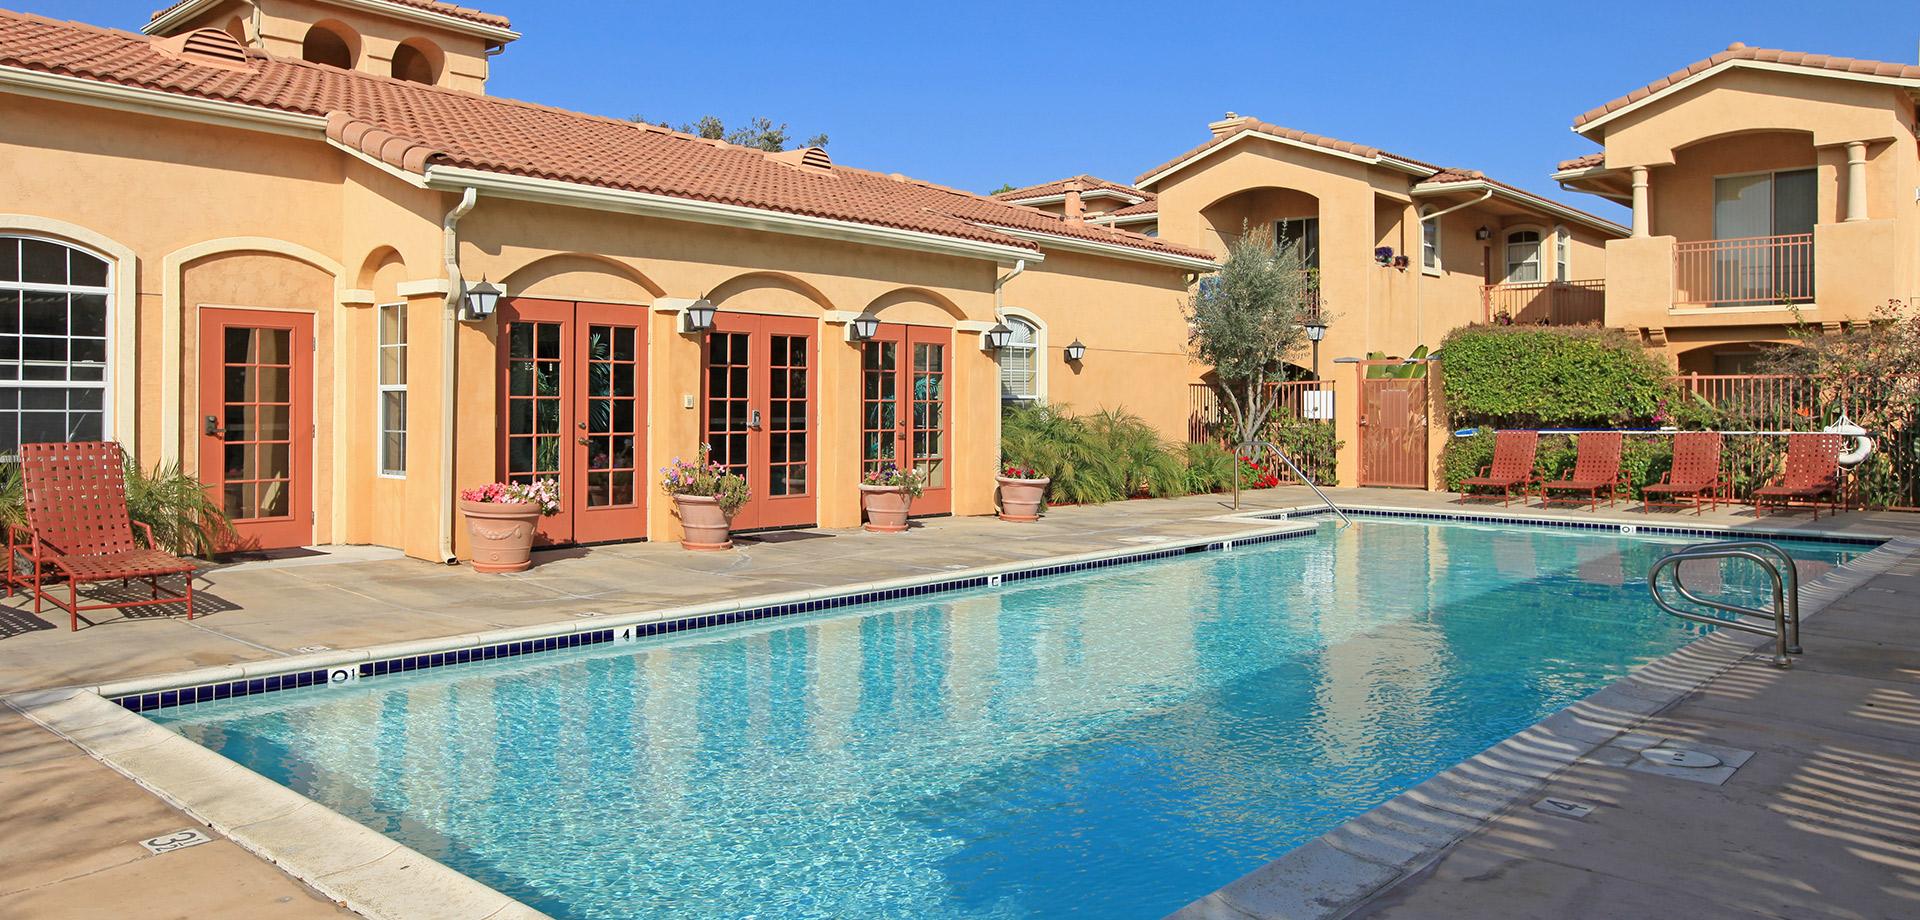 Villa Toscana Apartment Homes In Rancho San Diego Ca